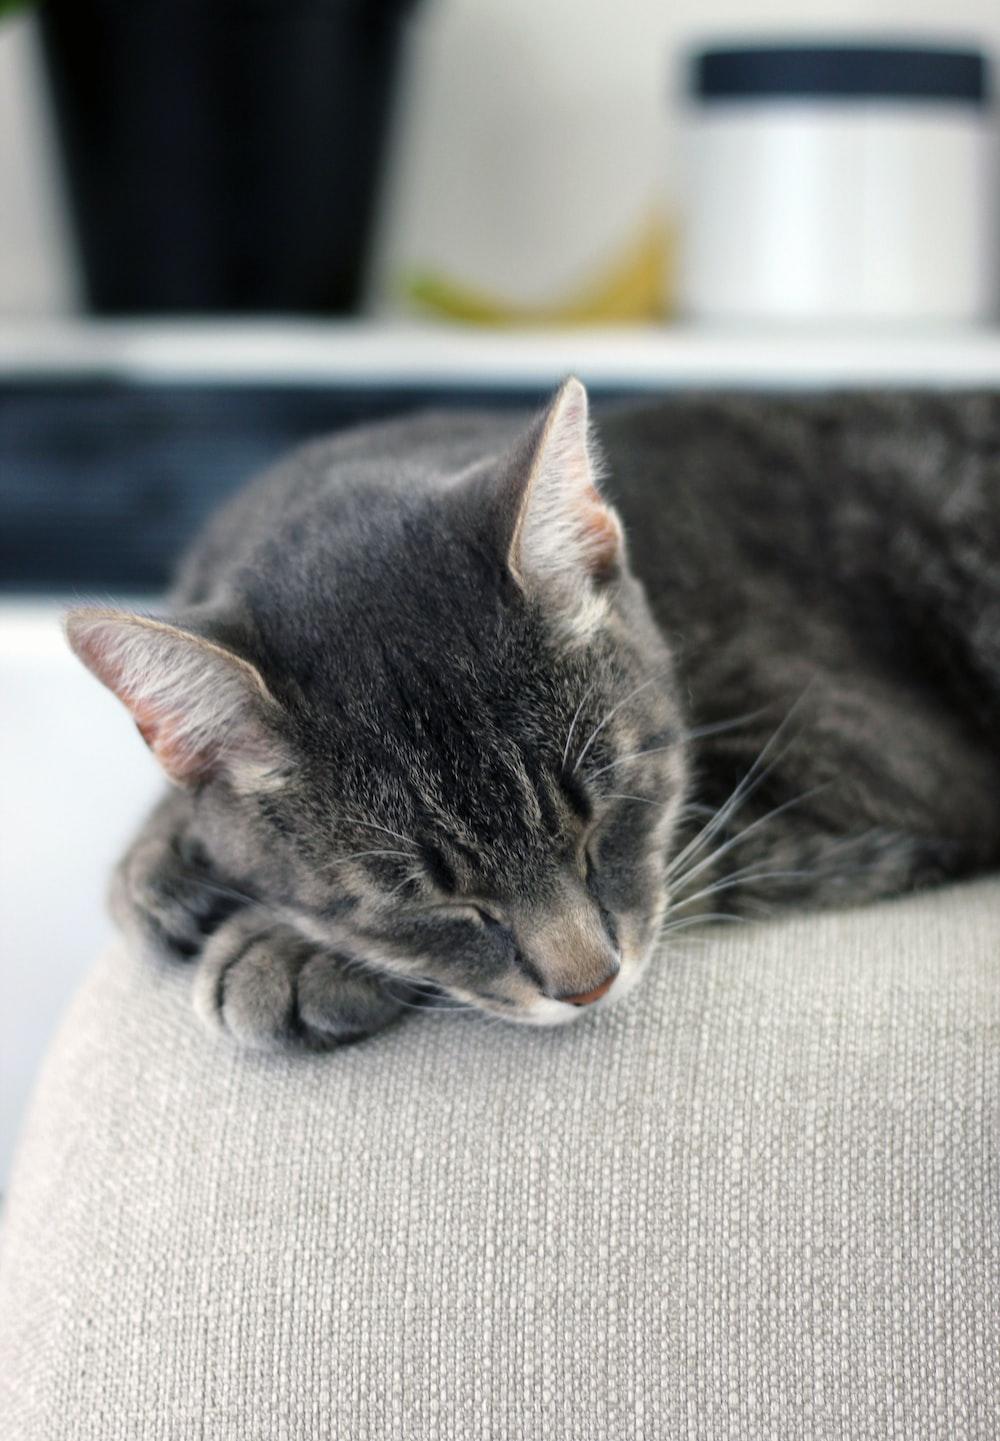 sleeping black and gray tabby cat